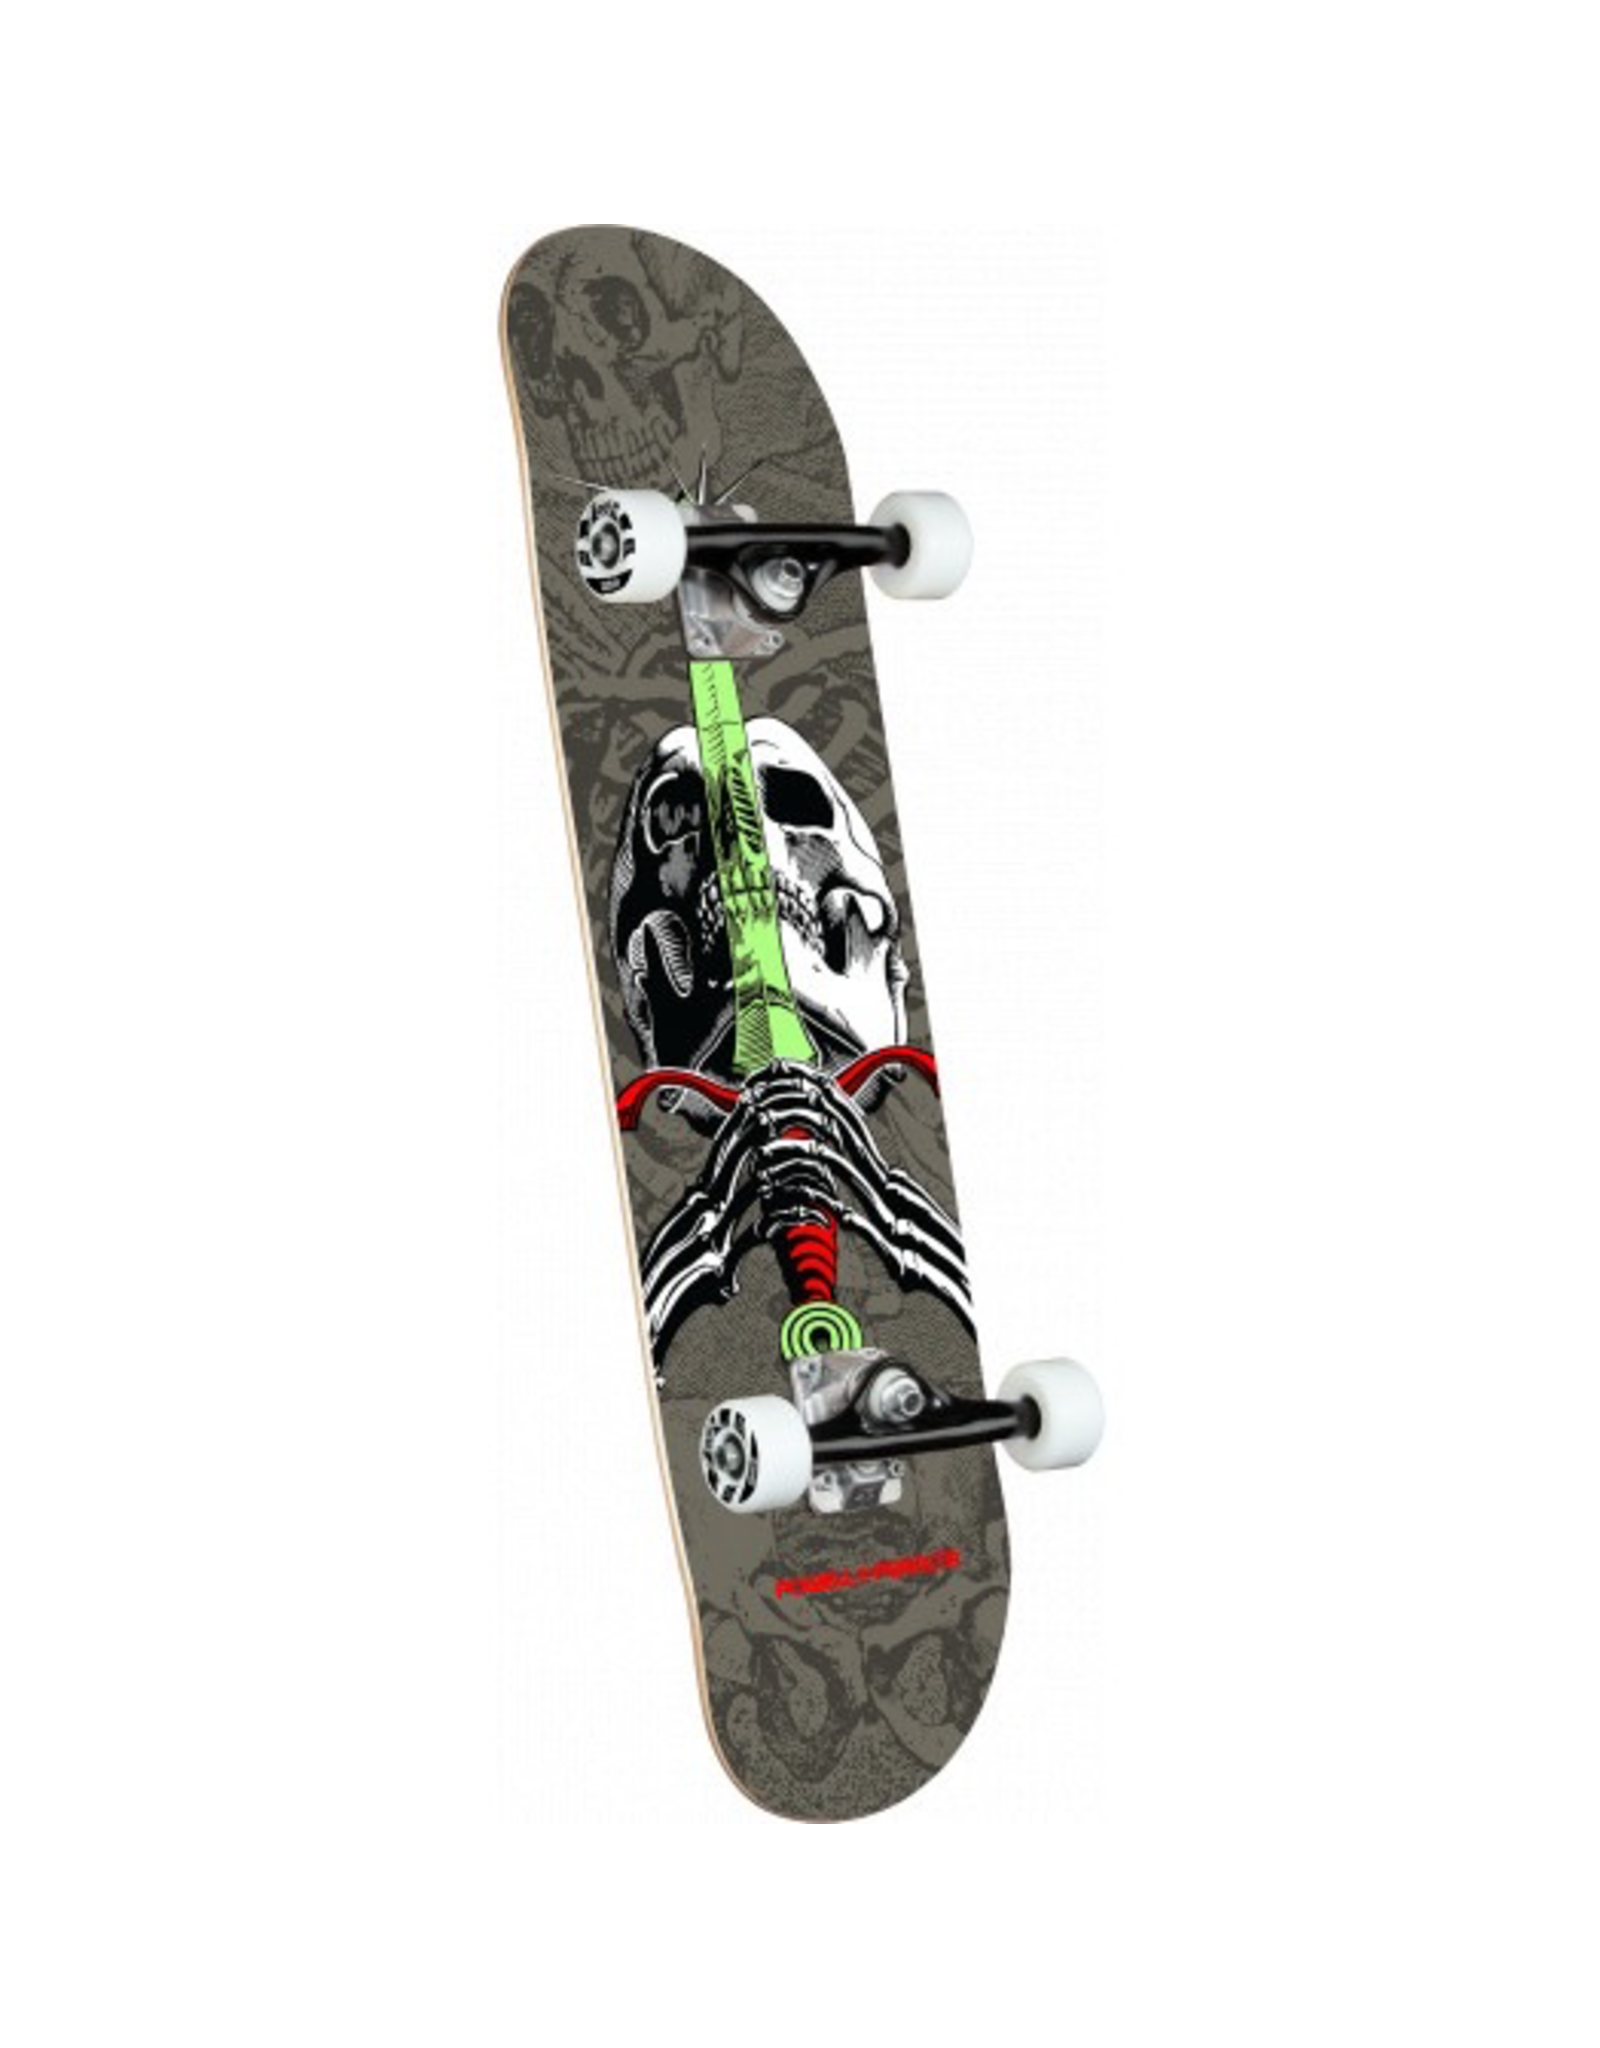 POWELL Powell Peralta Skull & Sword Gray Birch Complete Skateboard - 7.5 x 28.65